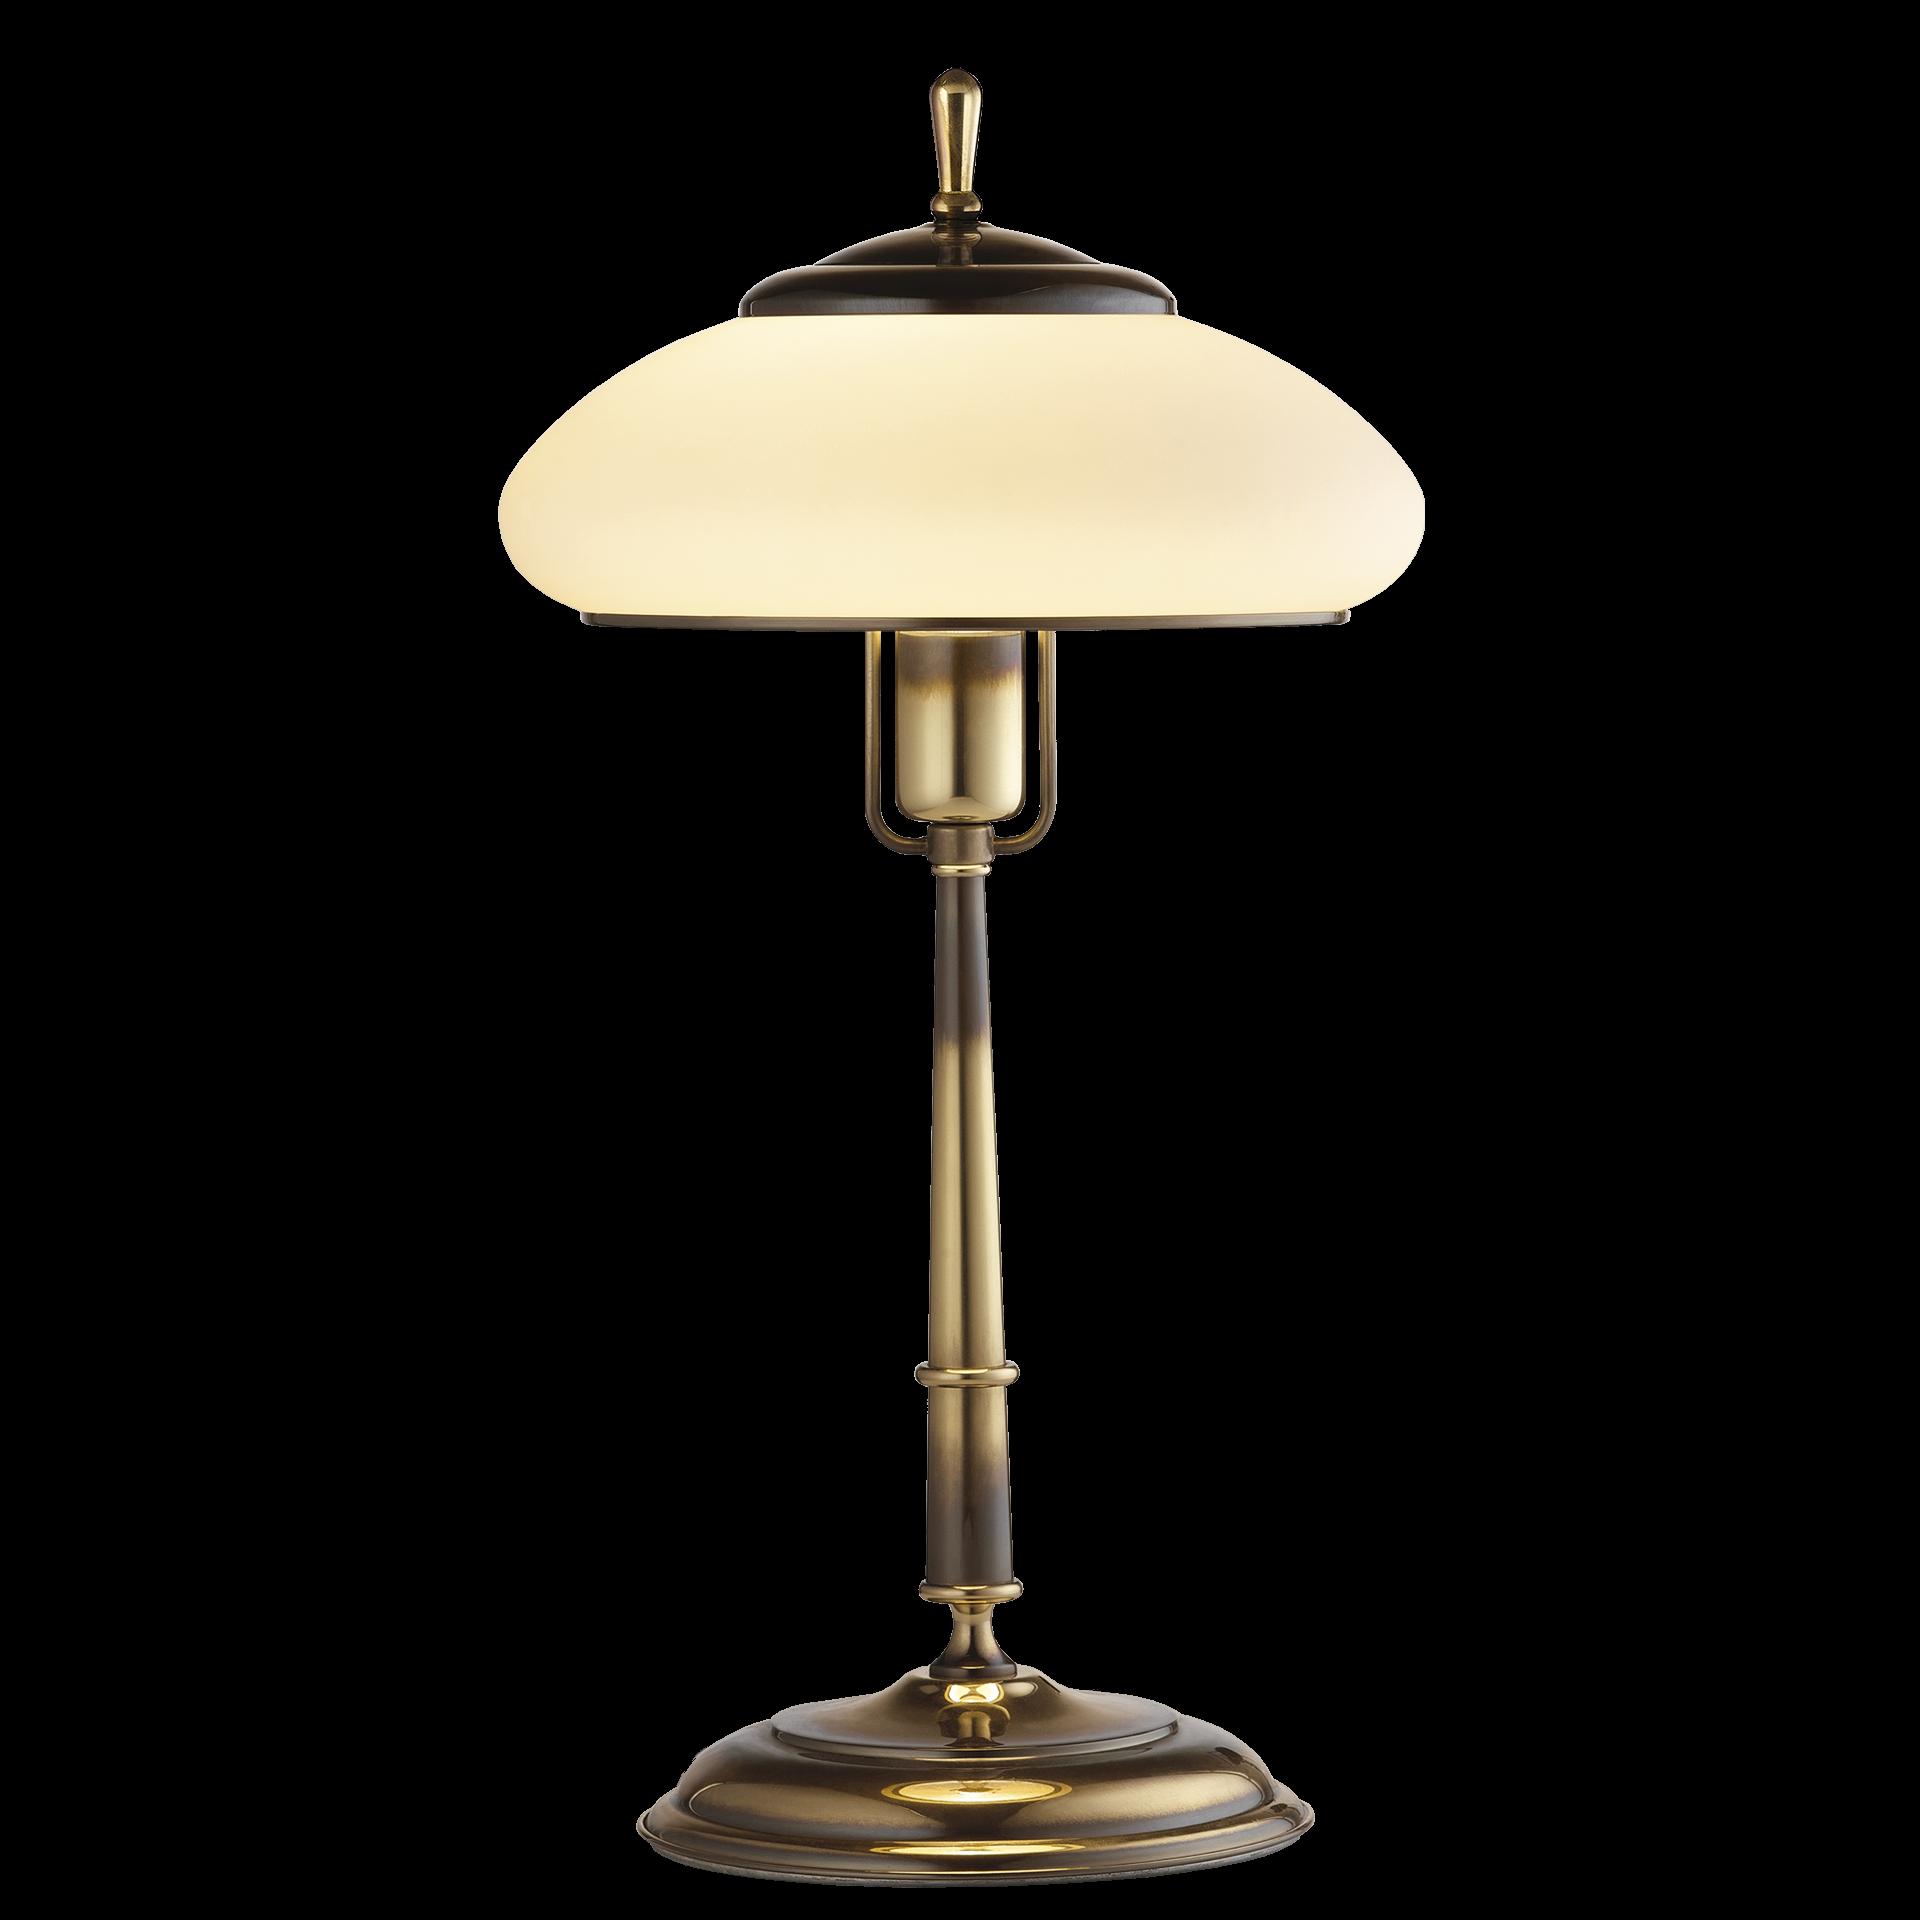 lampy gabinetowe sufitowe